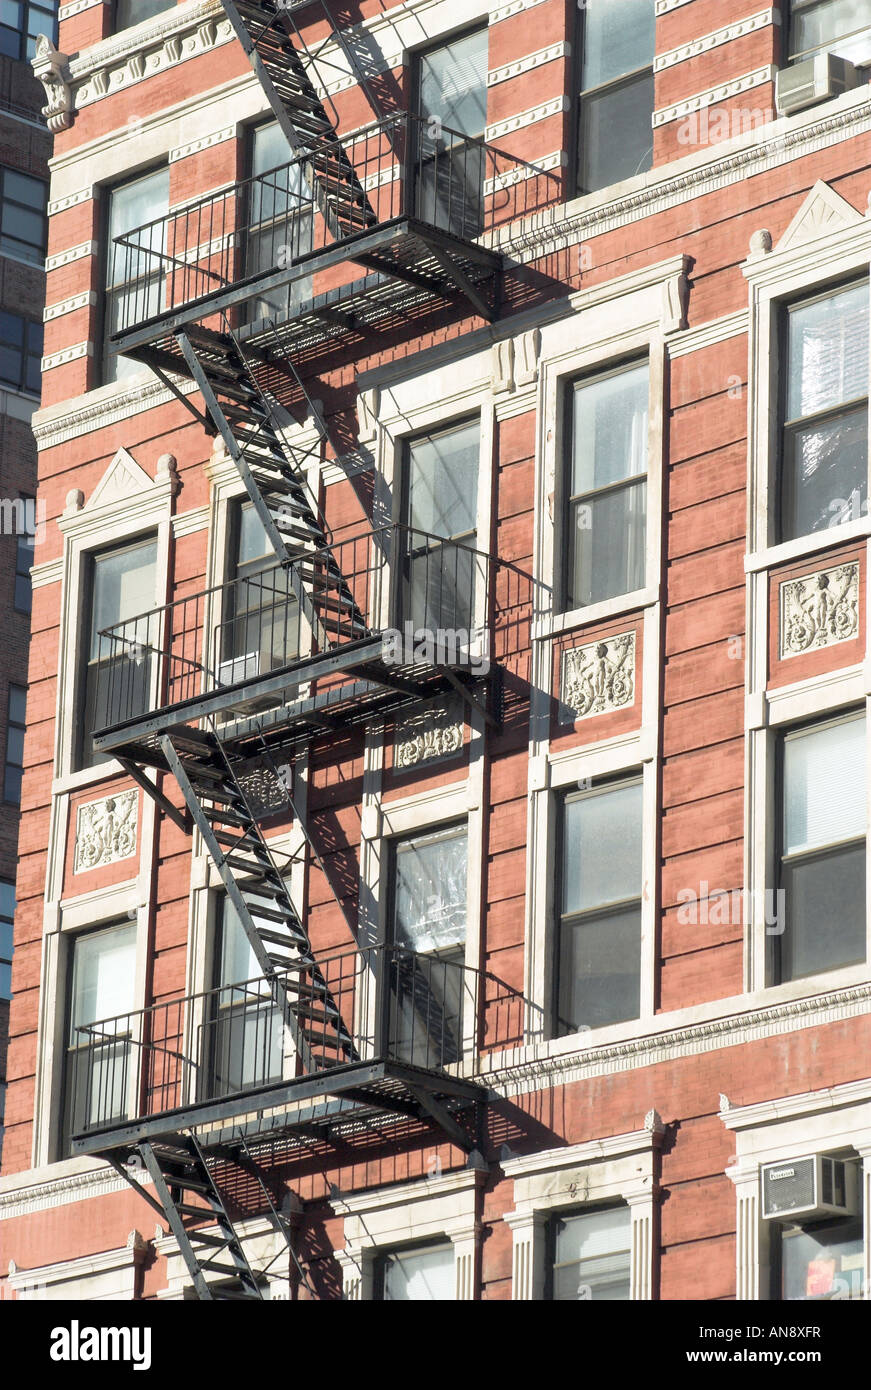 Un escalier de secours de la ville de New York, Manhattan Photo Stock